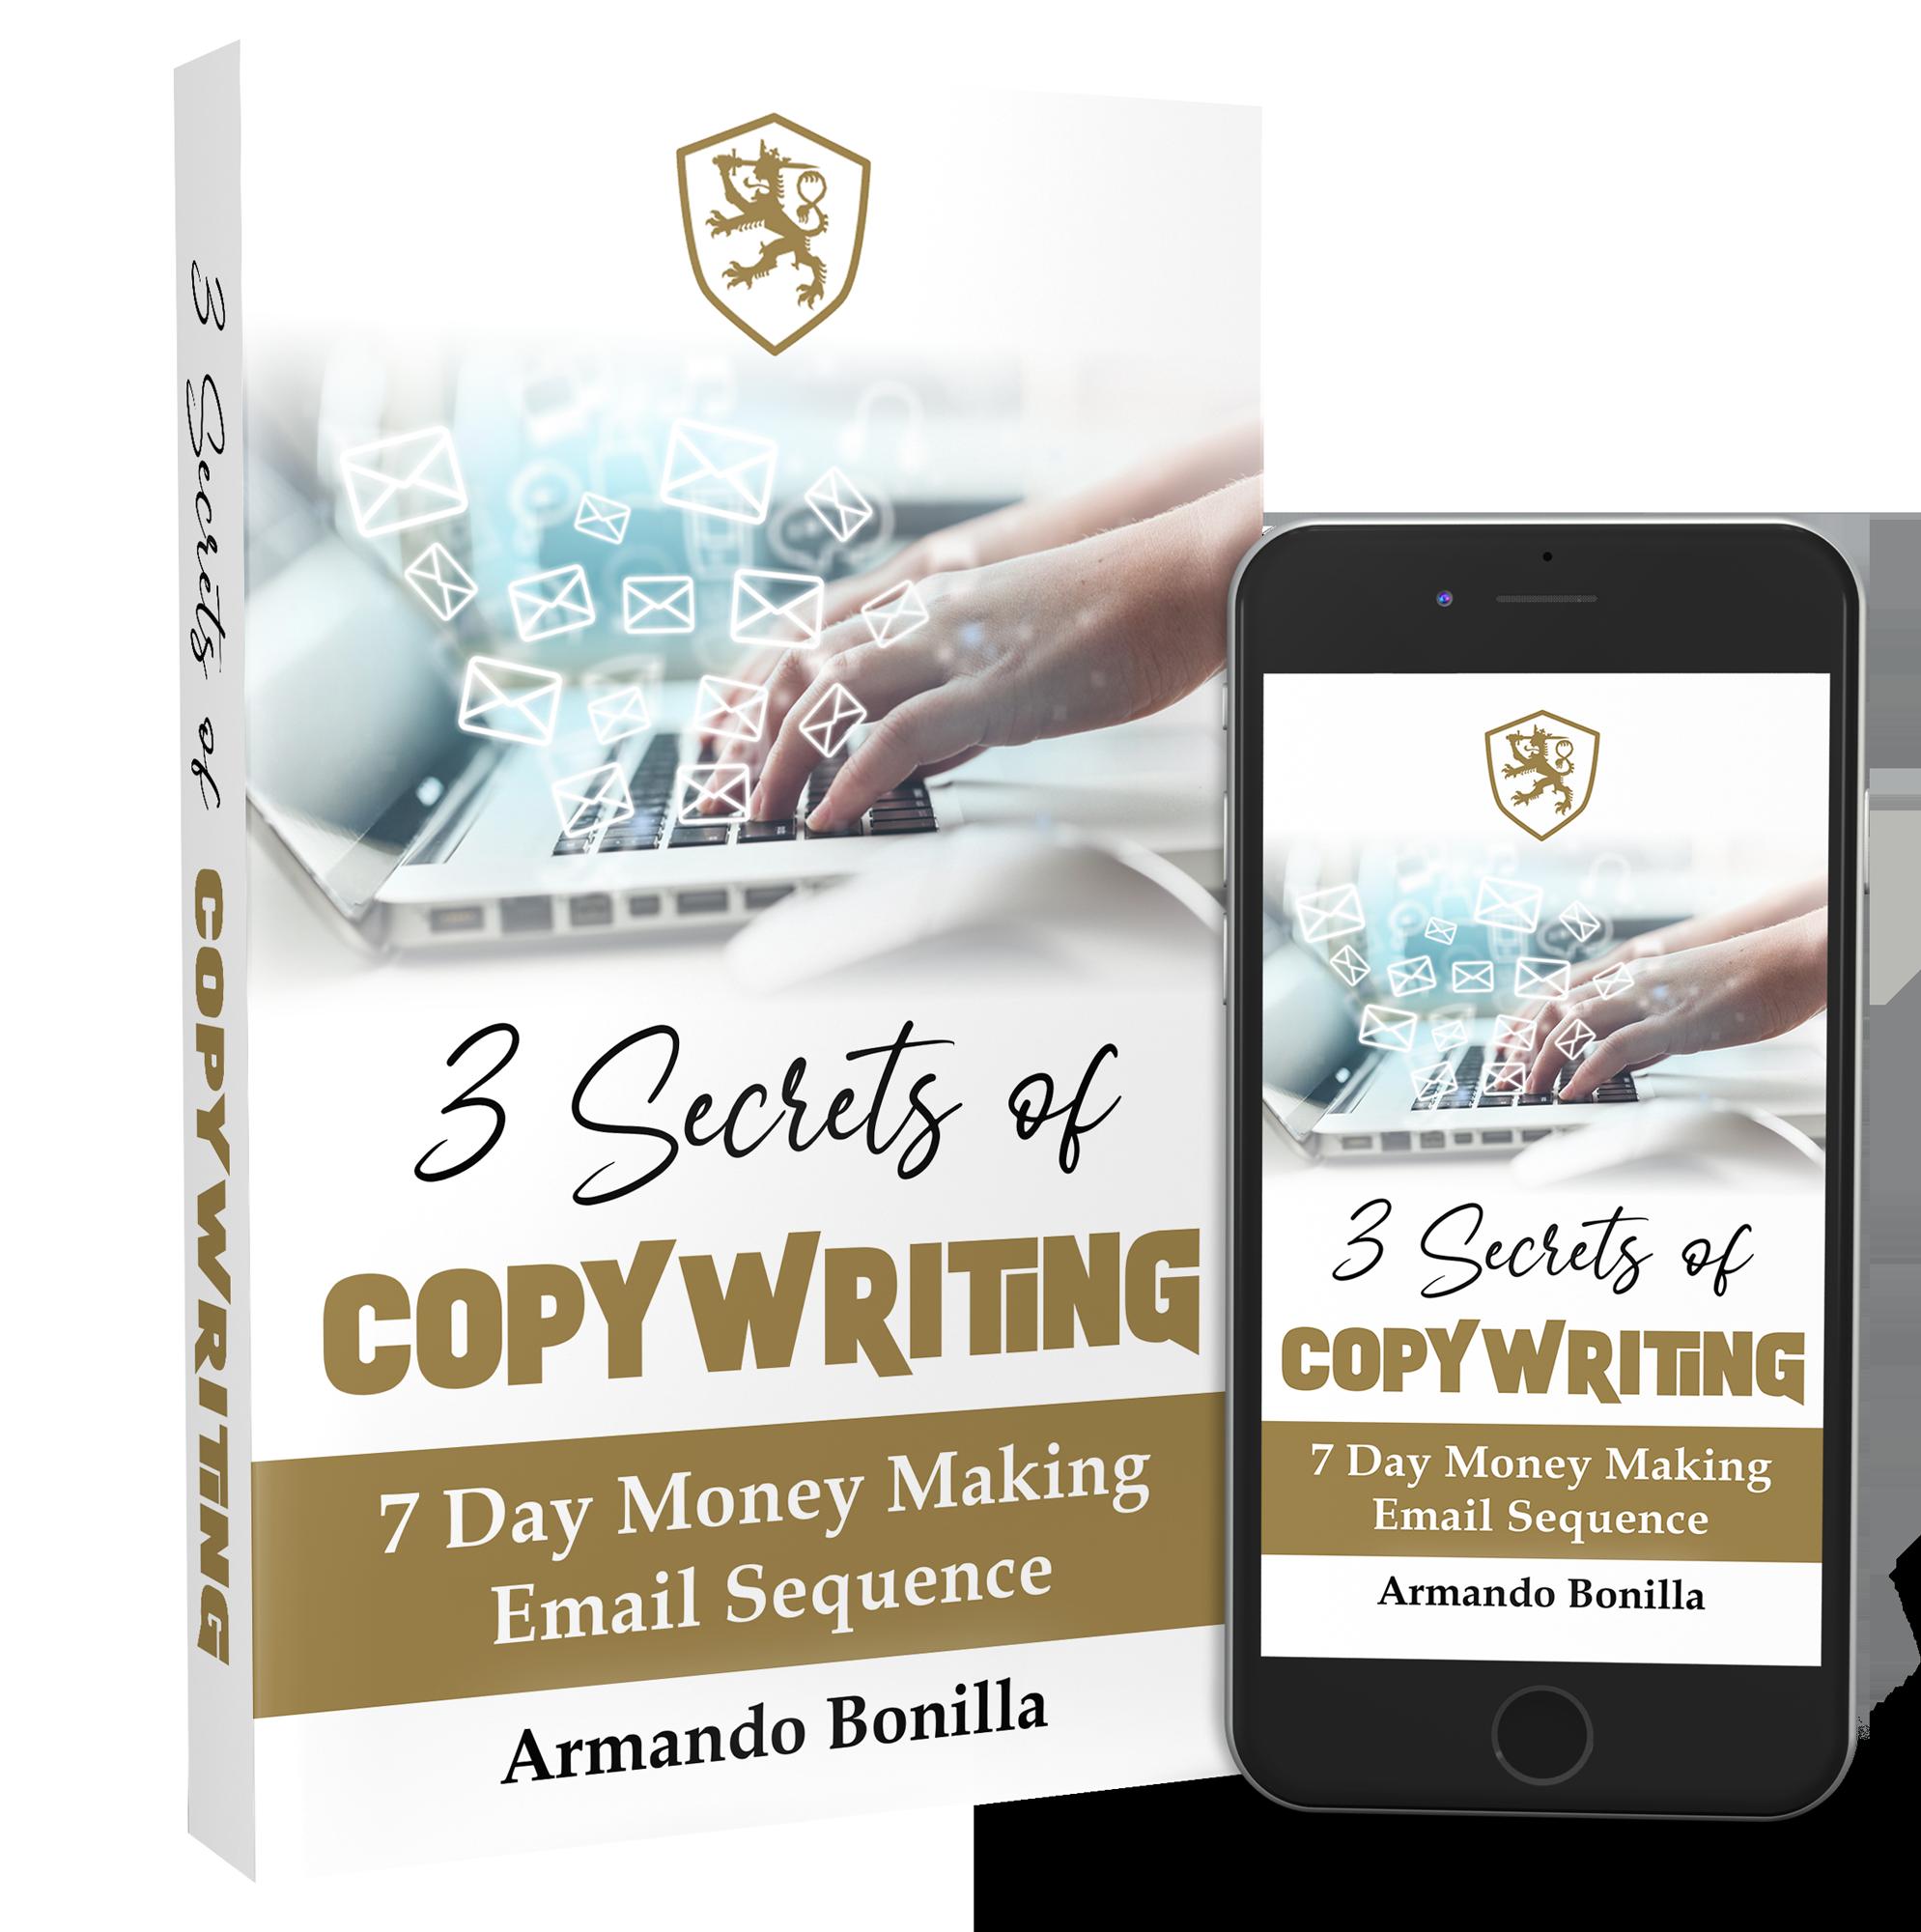 3 secrets of copy writting Ebook